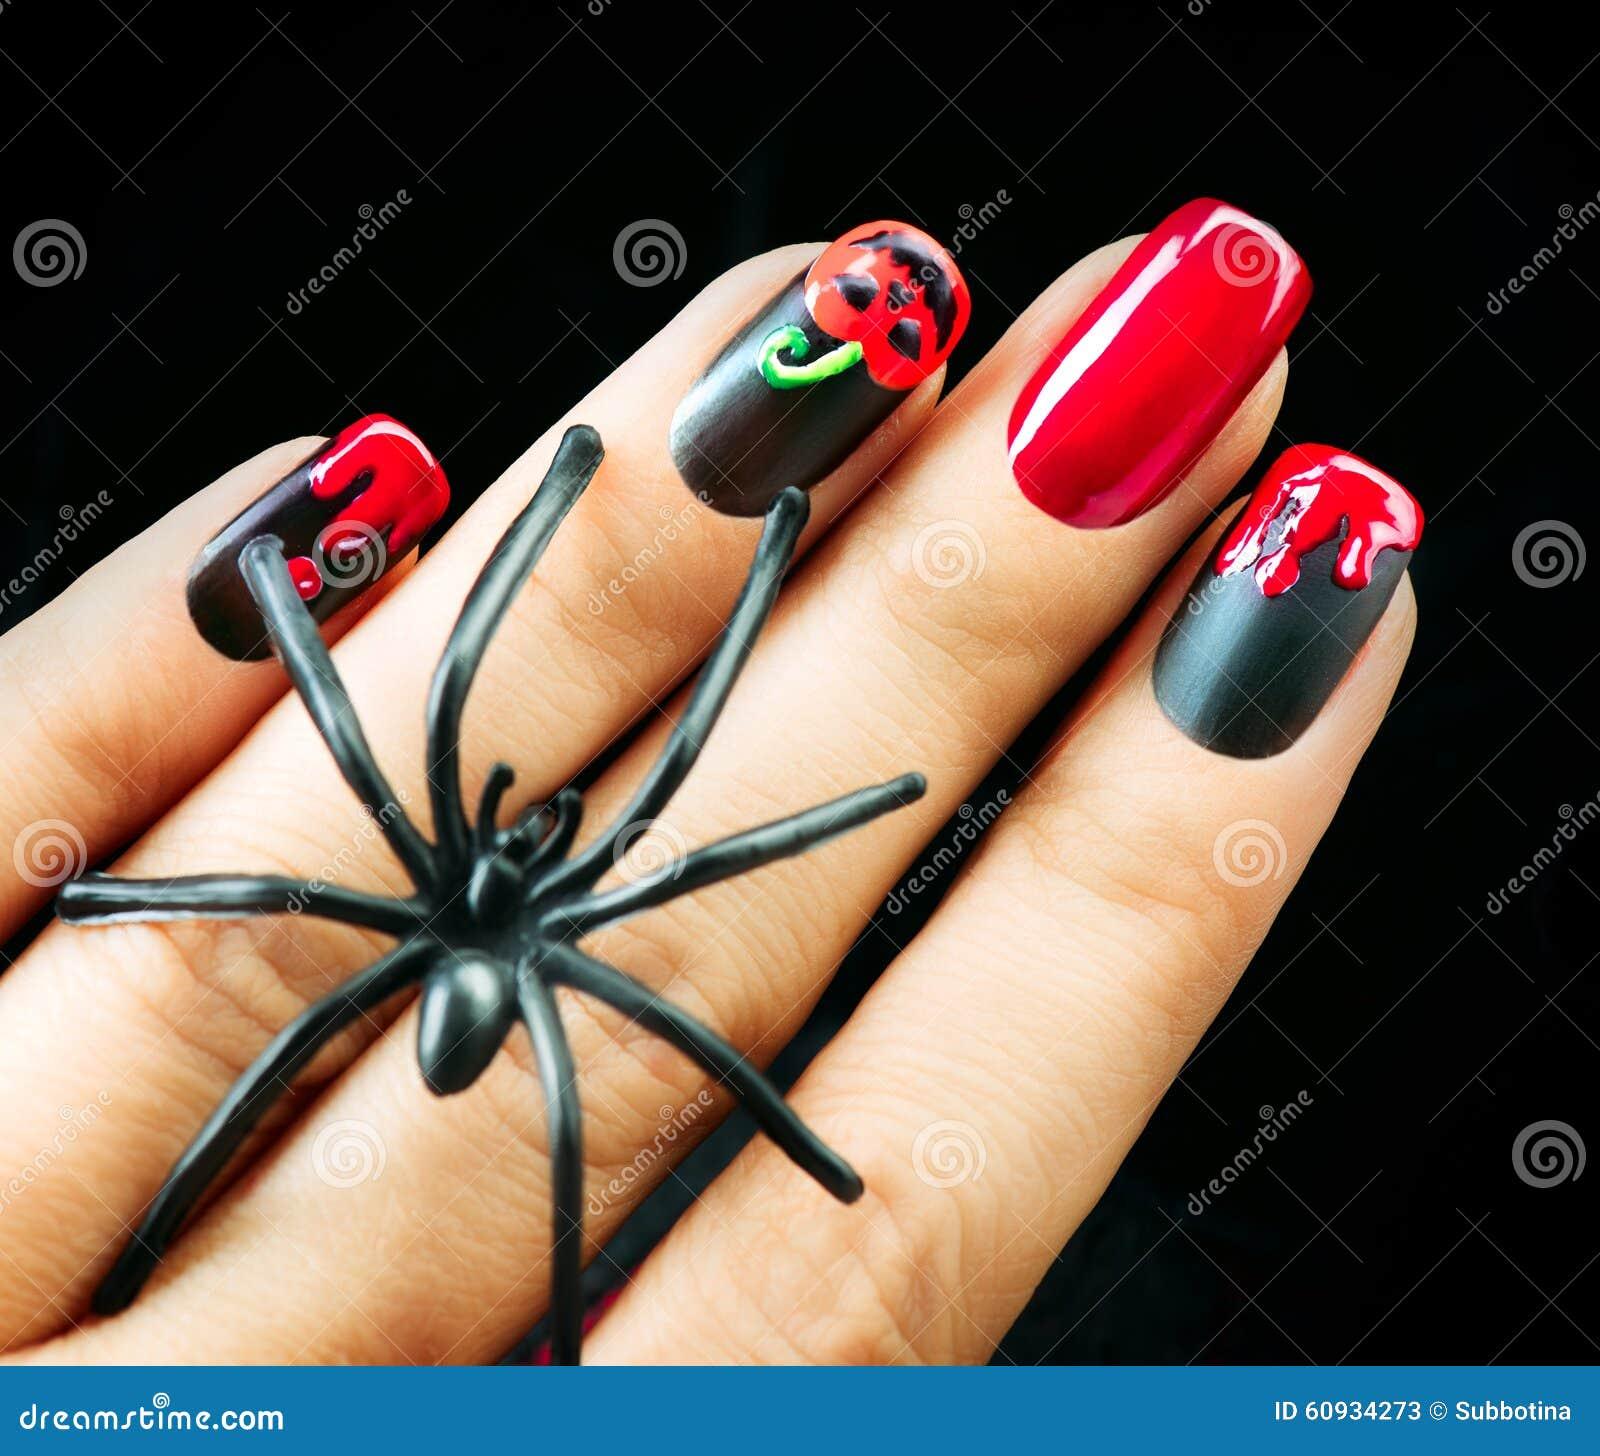 Halloween Nail Art Designs Without Nail Salon Prices: Halloween Nail Art Design. Black Matte Polish Stock Photo